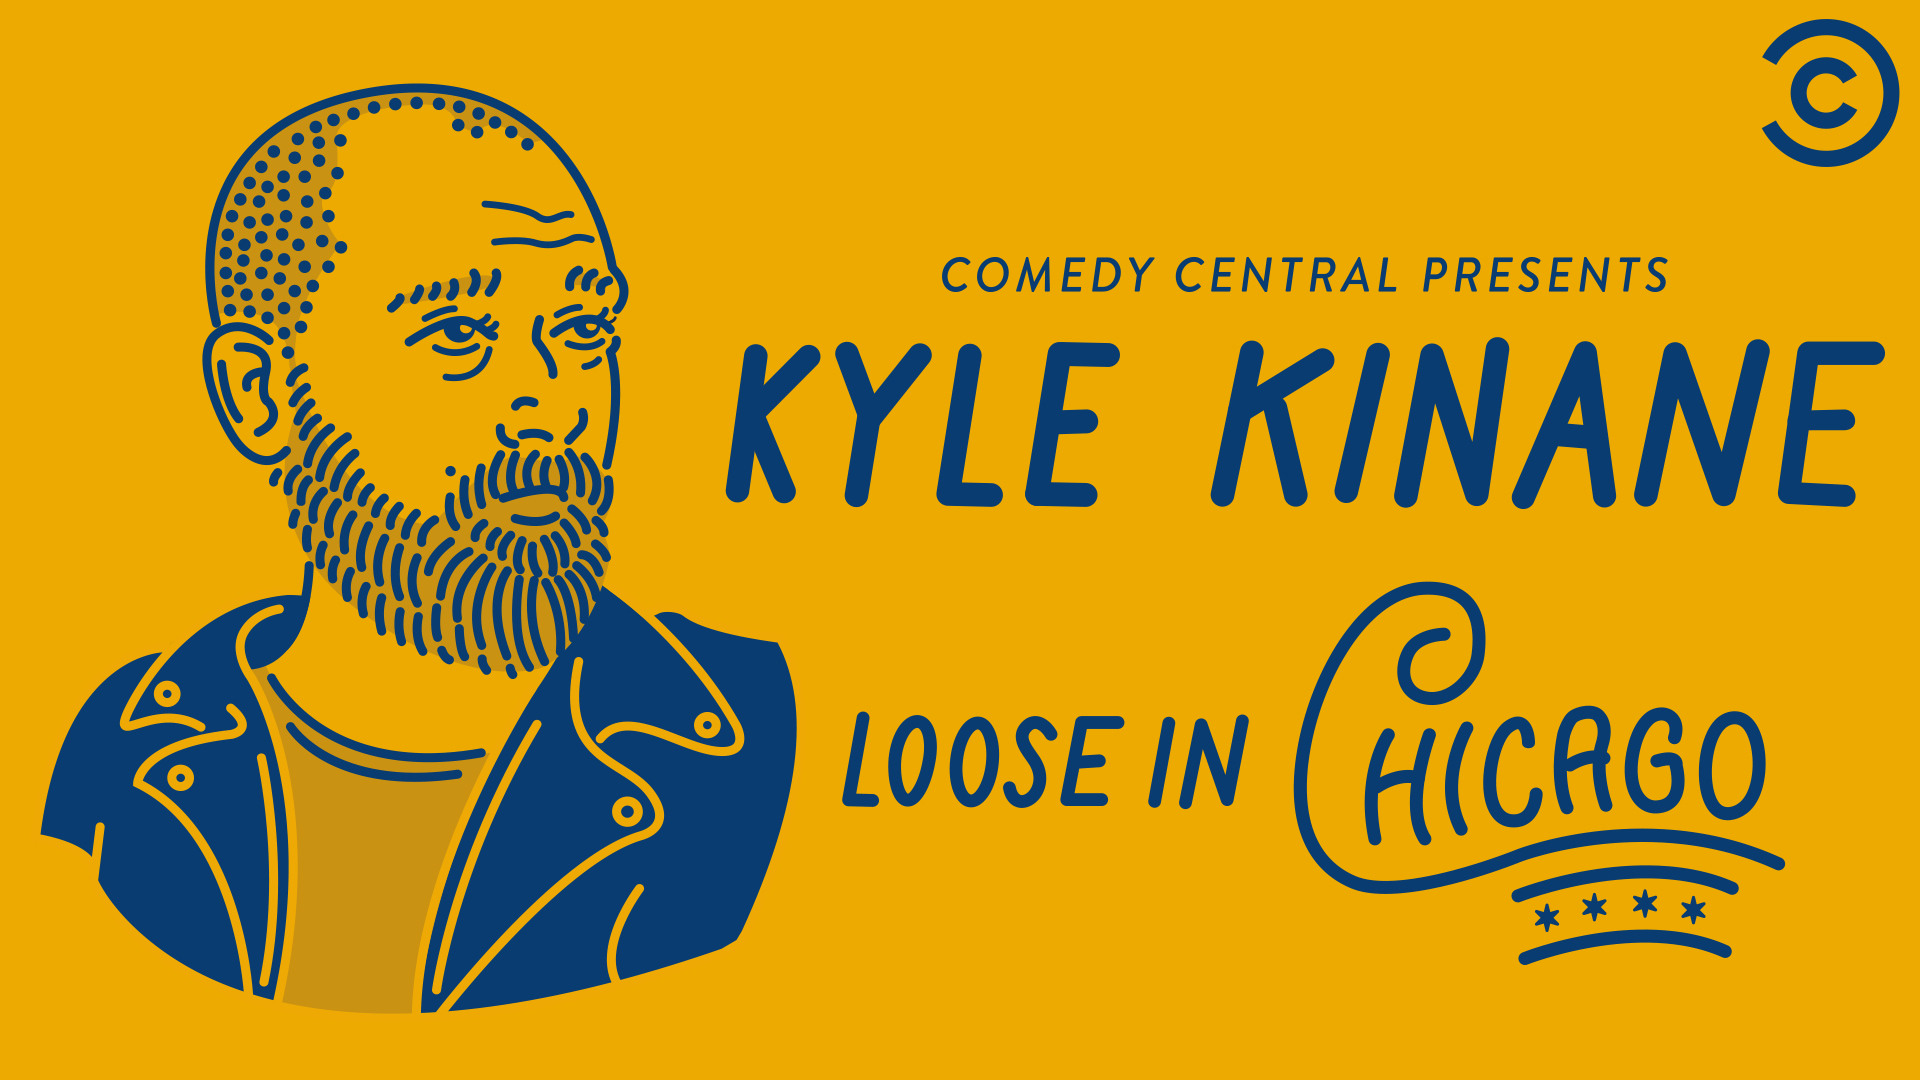 Kyle Kinane: Loose in Chicago